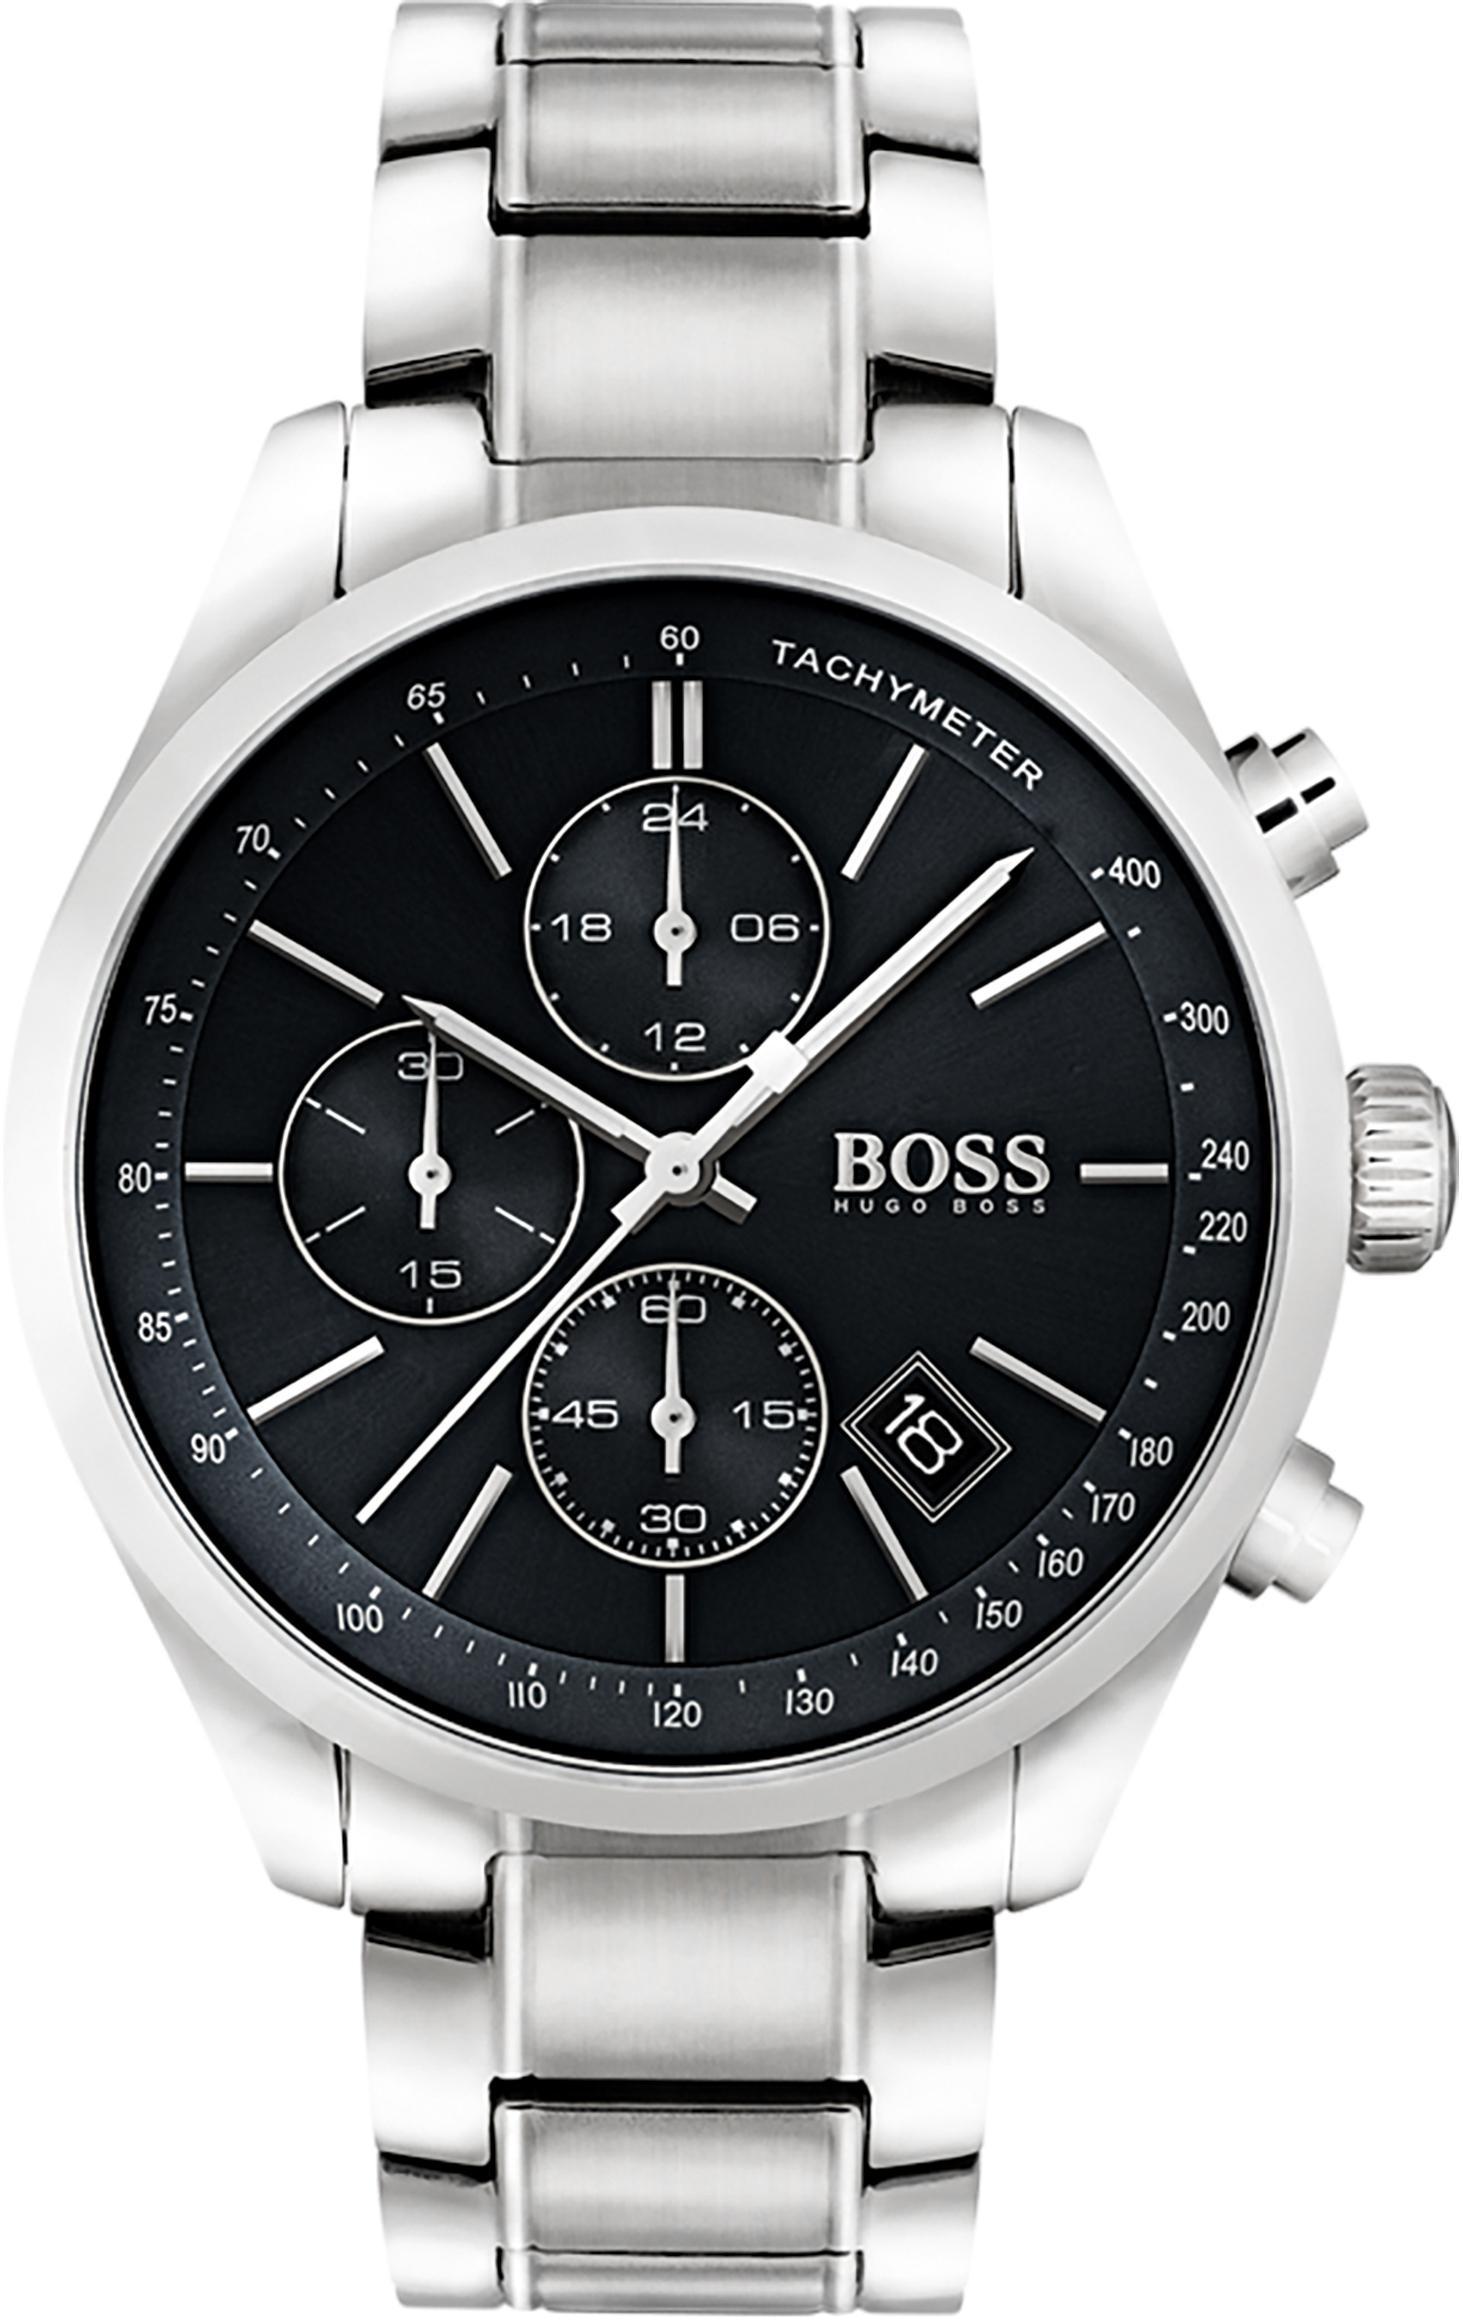 Boss Chronograph GRAND PRIX CASUAL SPORT 1513477 | Uhren | Boss